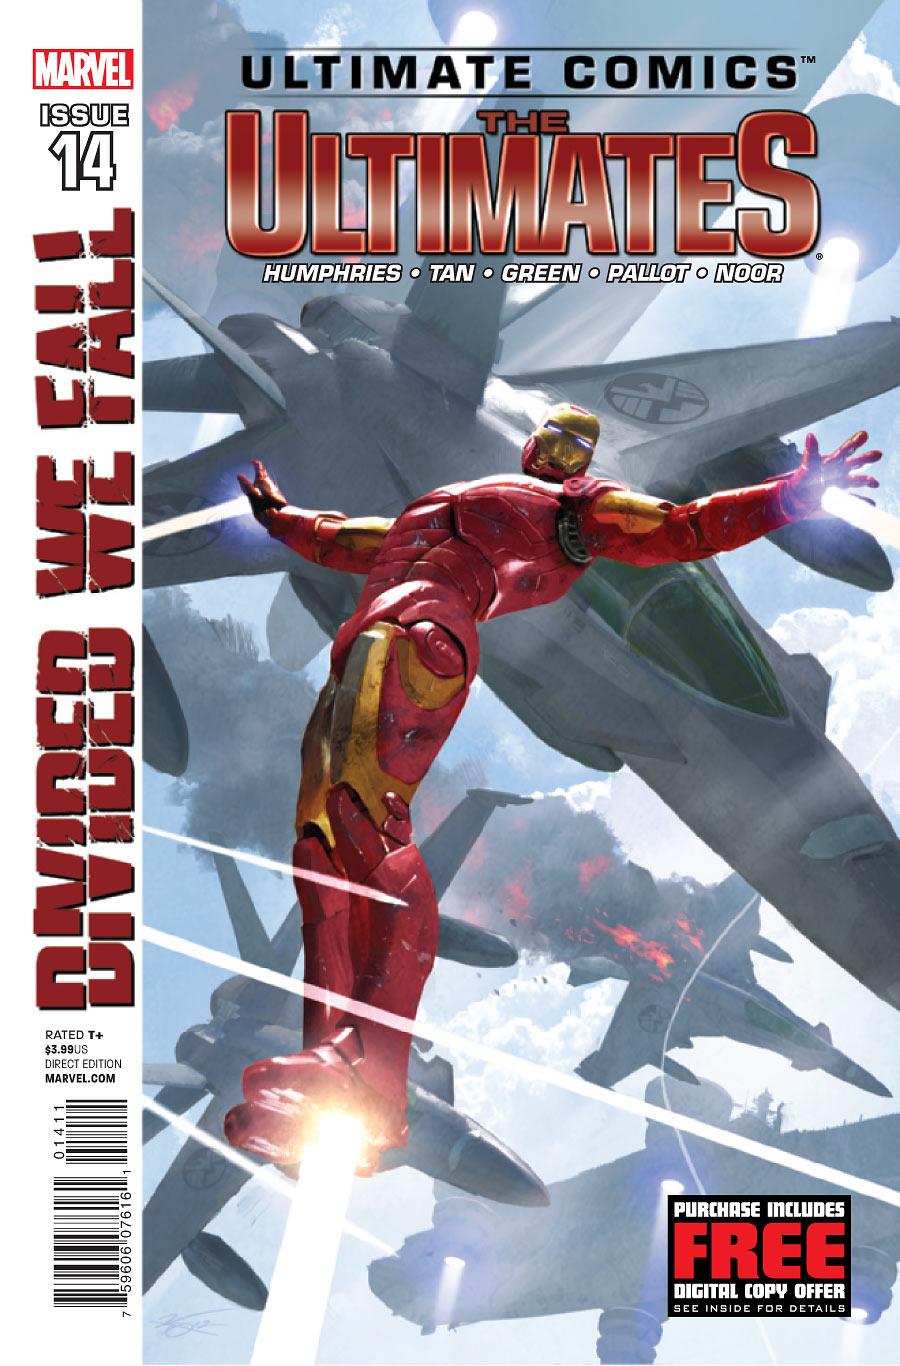 Ultimate Comics: The Ultimates #14